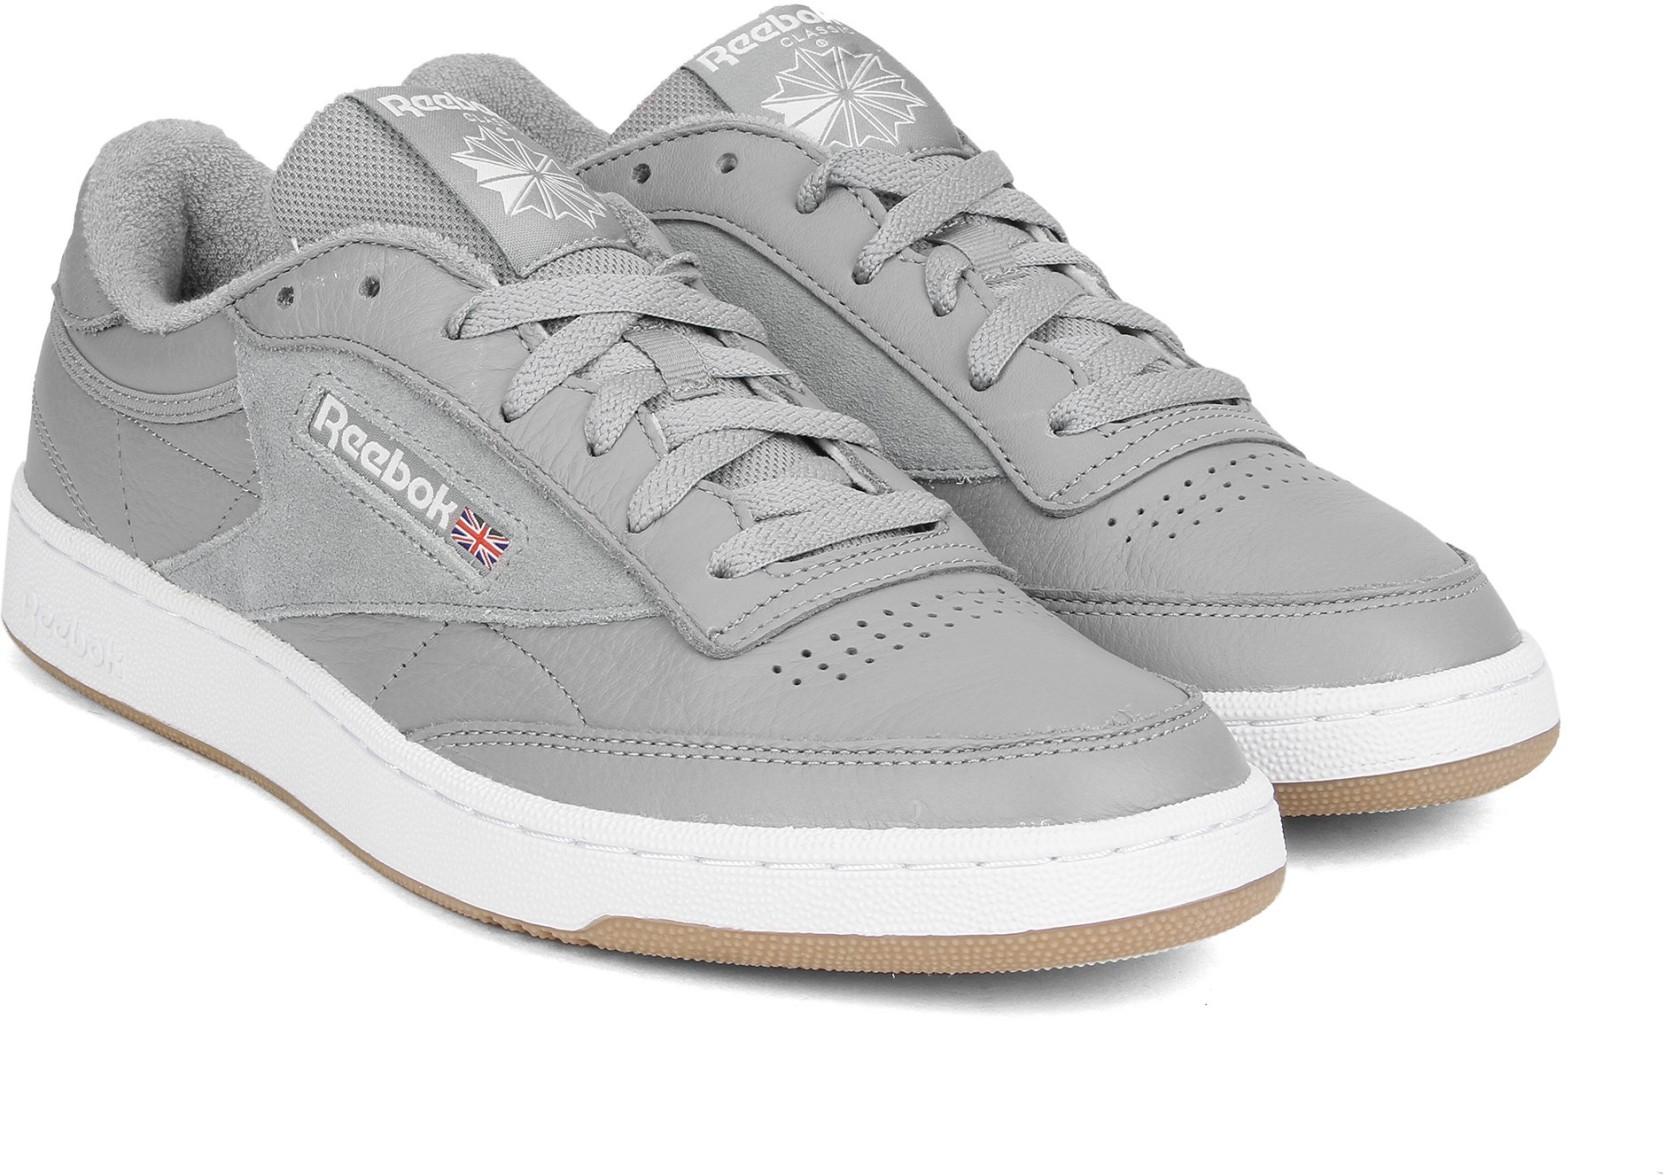 e99bf0f8291 REEBOK CLUB C 85 ESTL Sneakers For Men - Buy POWDER GREY WHT WSHD ...